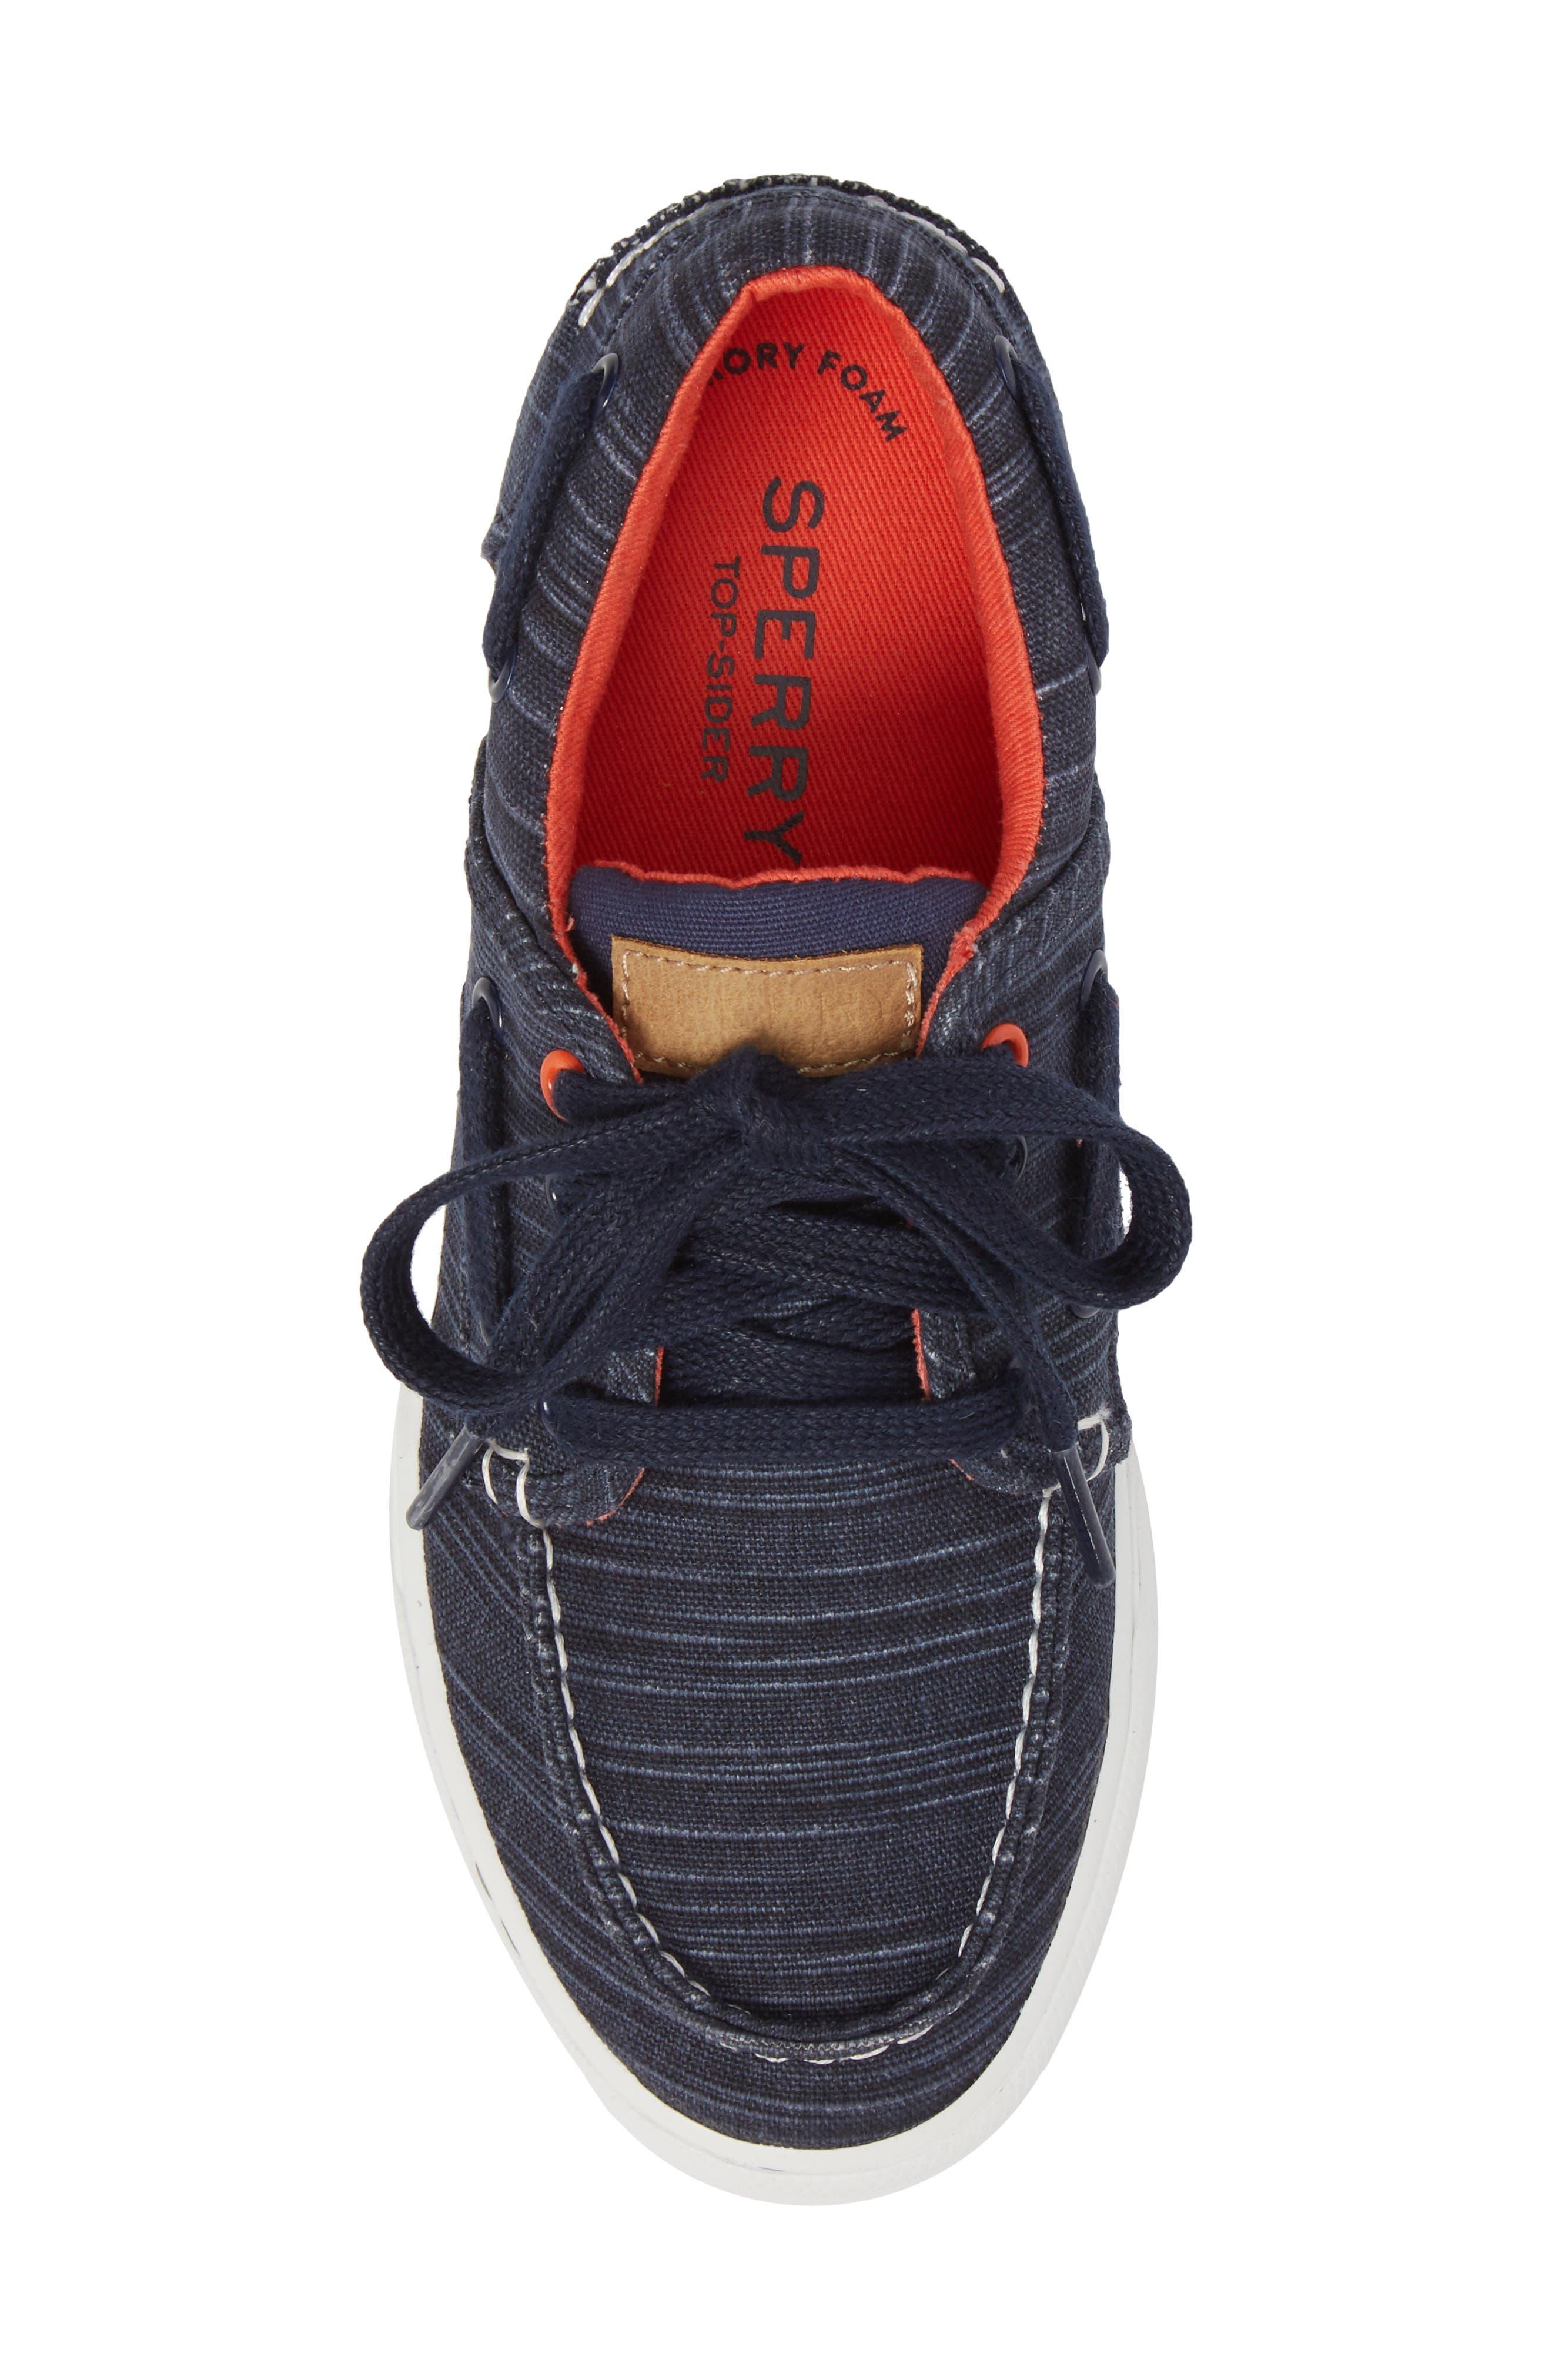 Striper II Boat Shoe,                             Alternate thumbnail 5, color,                             Navy